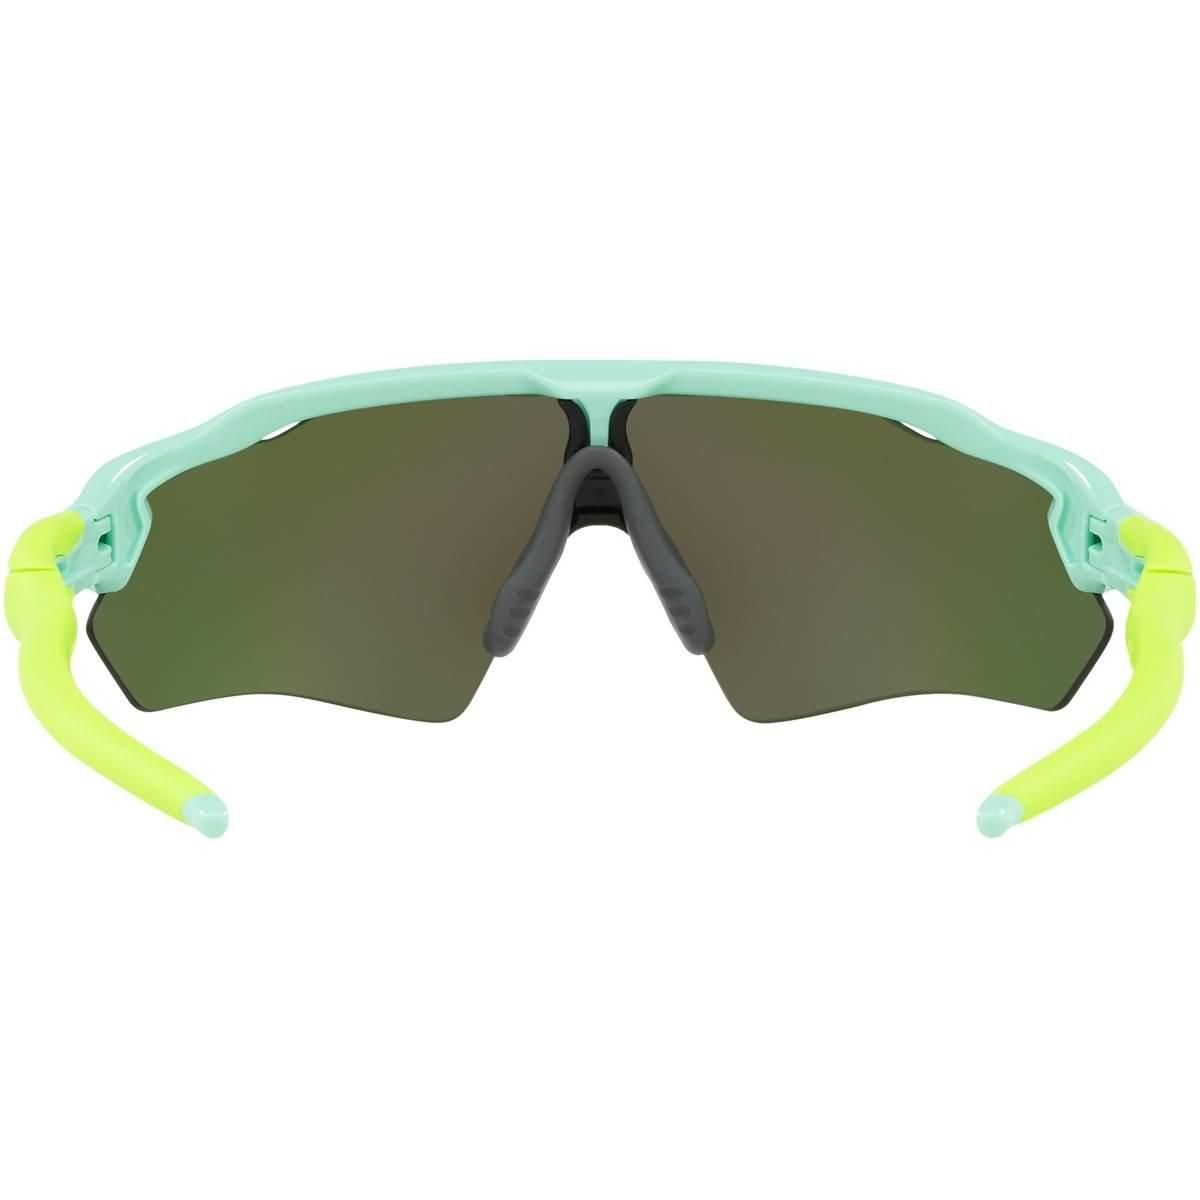 ccad085cde Amazon.com  Oakley Youth Radar EV XS Path Sunglasses